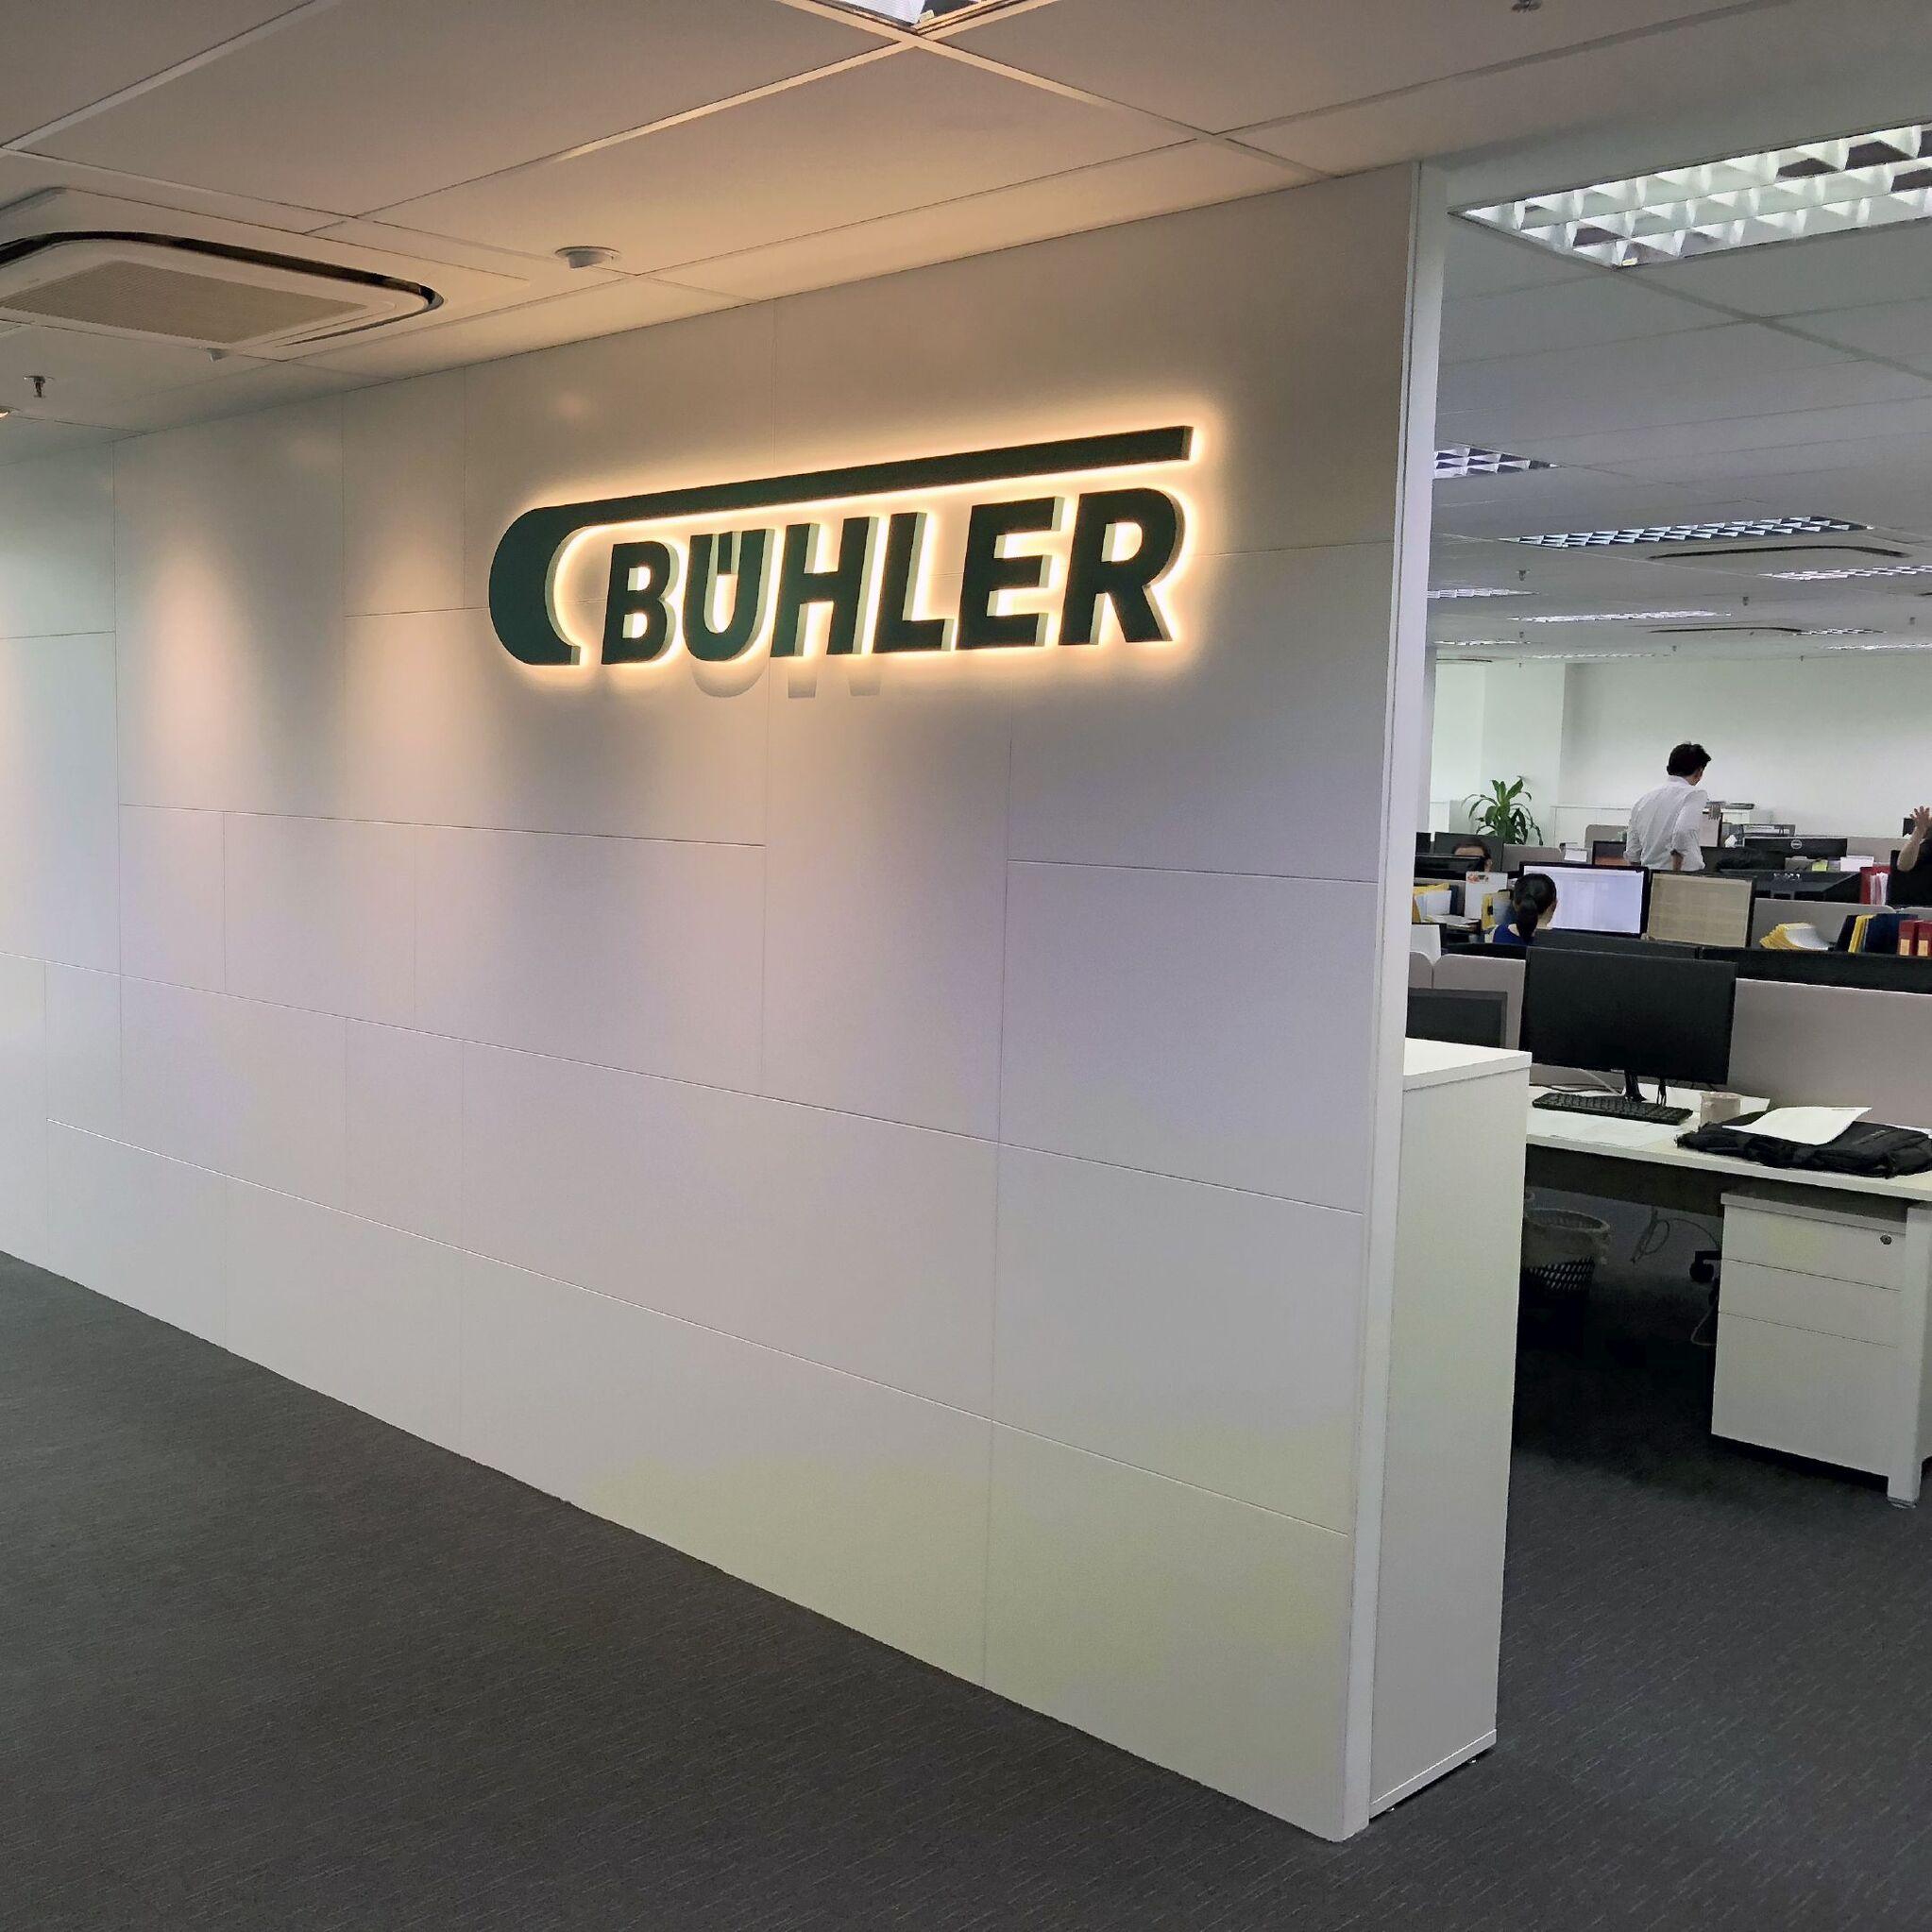 Bühler office in Singapore